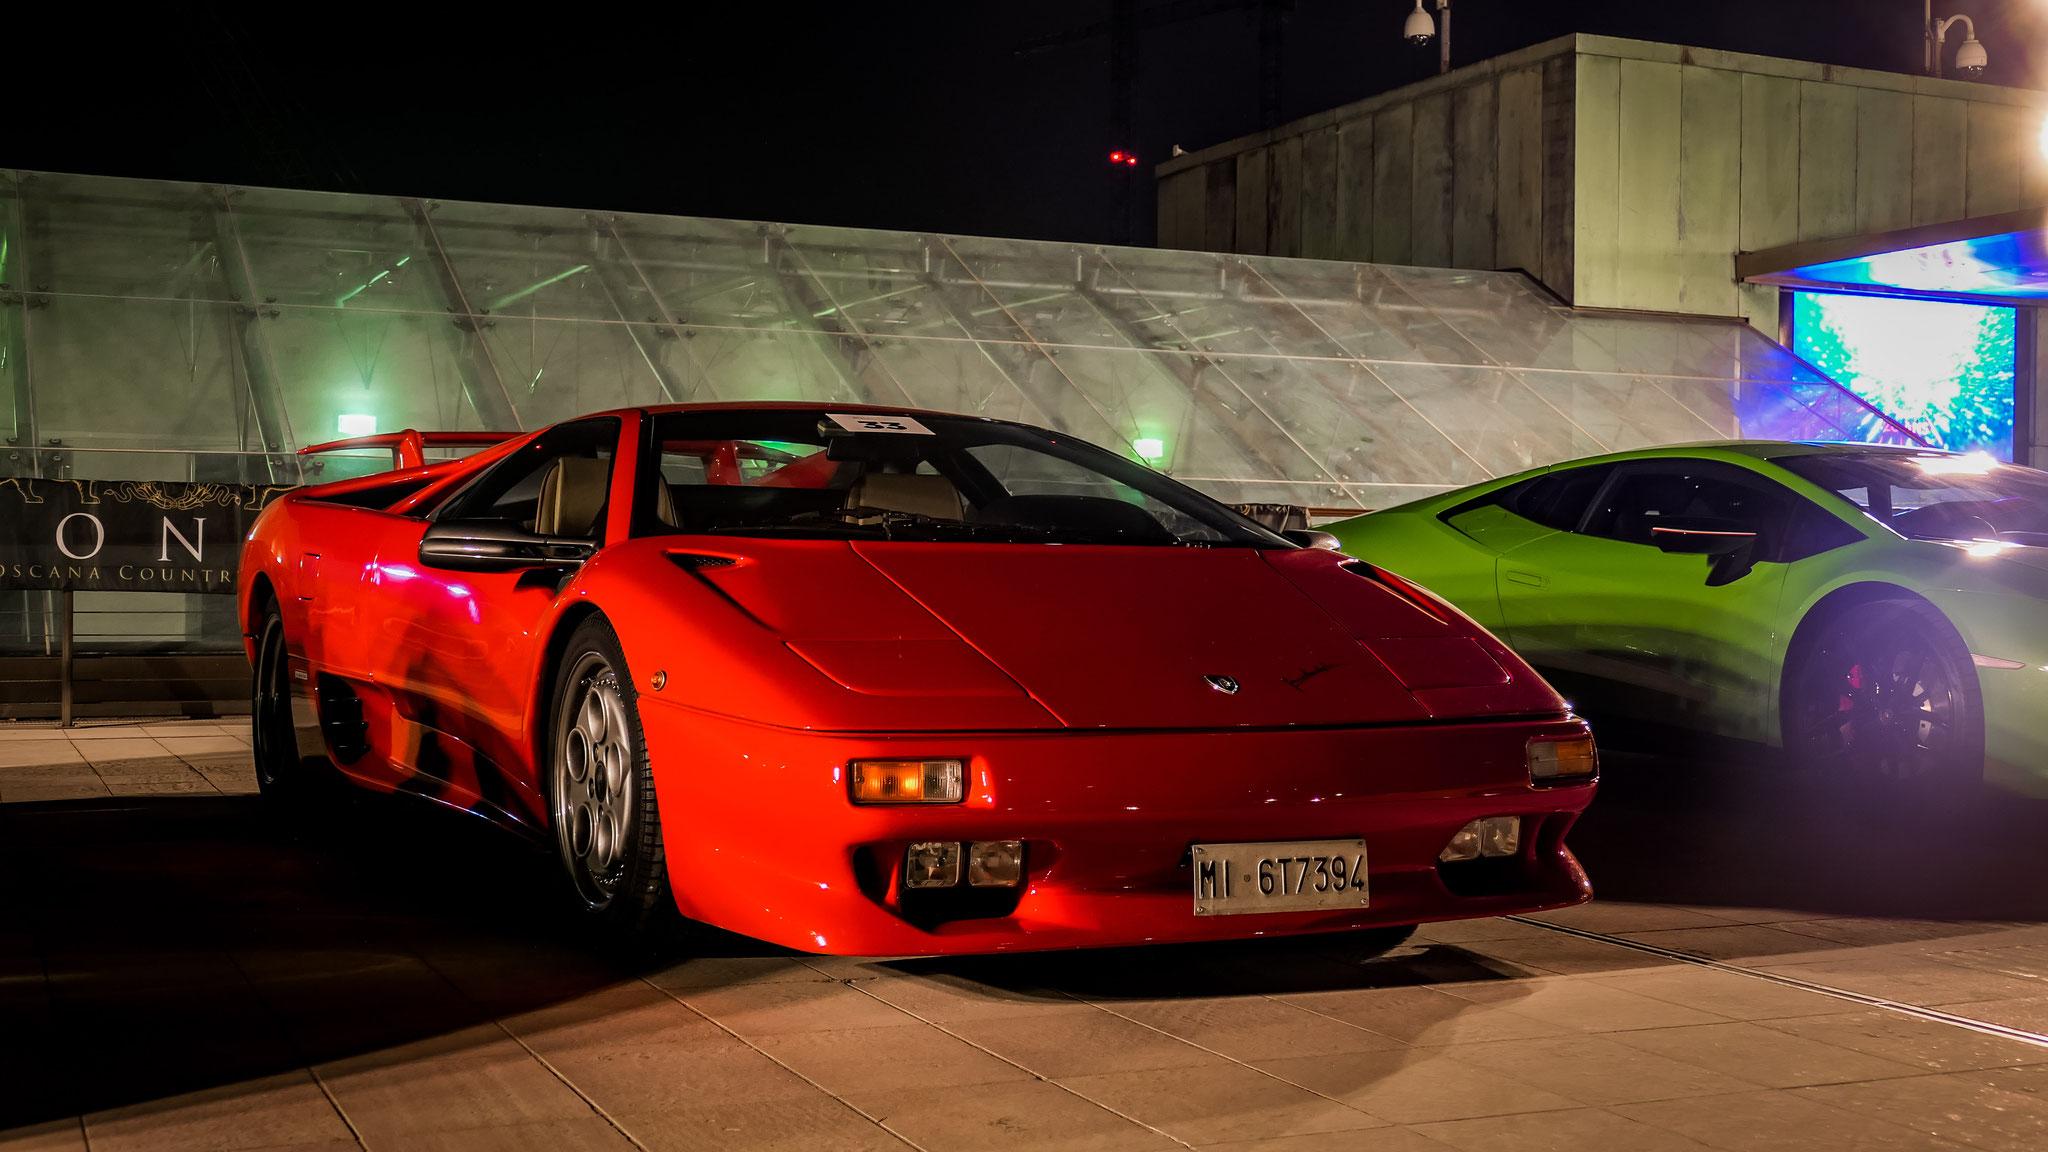 Lamborghini Diablo VT - MI-6T7394 (ITA)